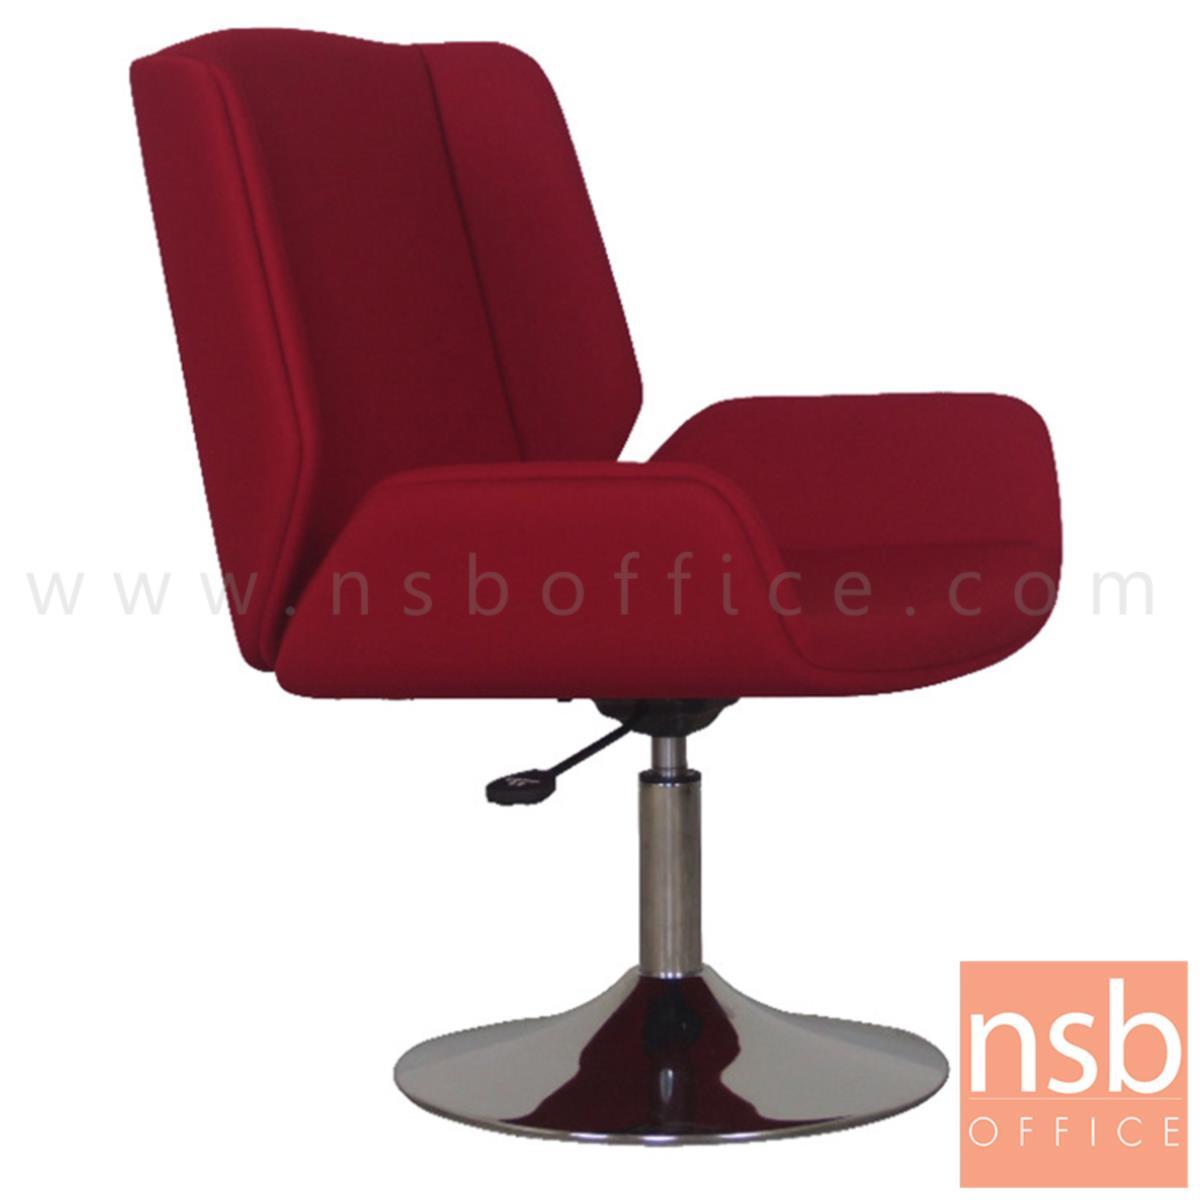 B29A241:เก้าอี้โมเดิร์นบาร์หุ้มผ้า รุ่น MM-FC-2R ขนาด 60W cm. โช๊คแก๊ส ฐานจานกลมโครเมี่ยม